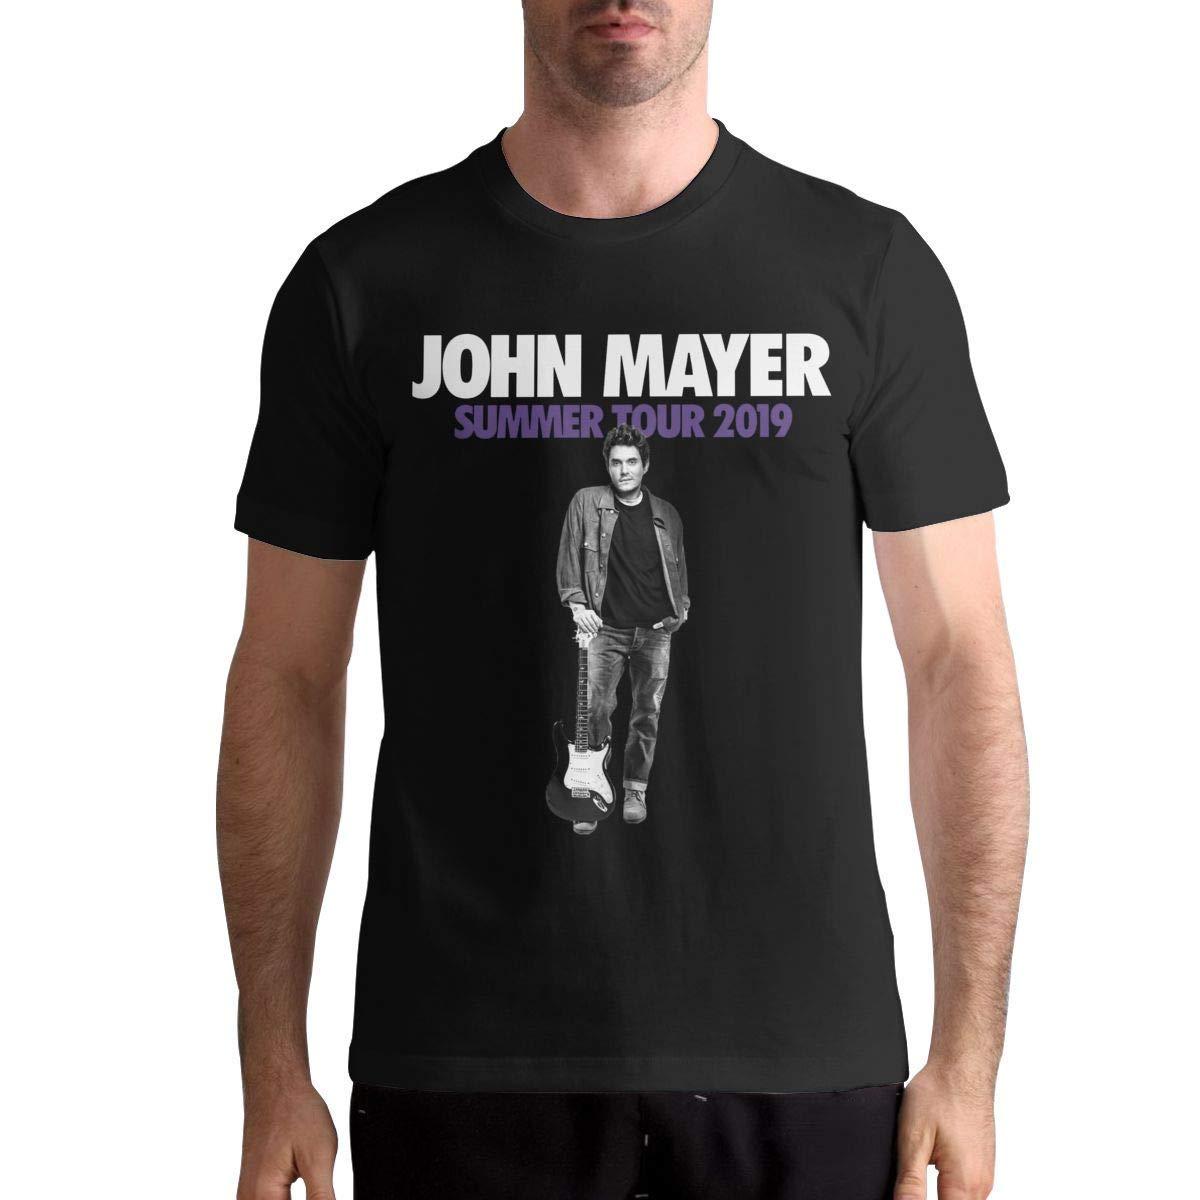 John Mayer T Shirt S T Shirt Fashion Sports Tops Round Neck Short Sleeve Tee